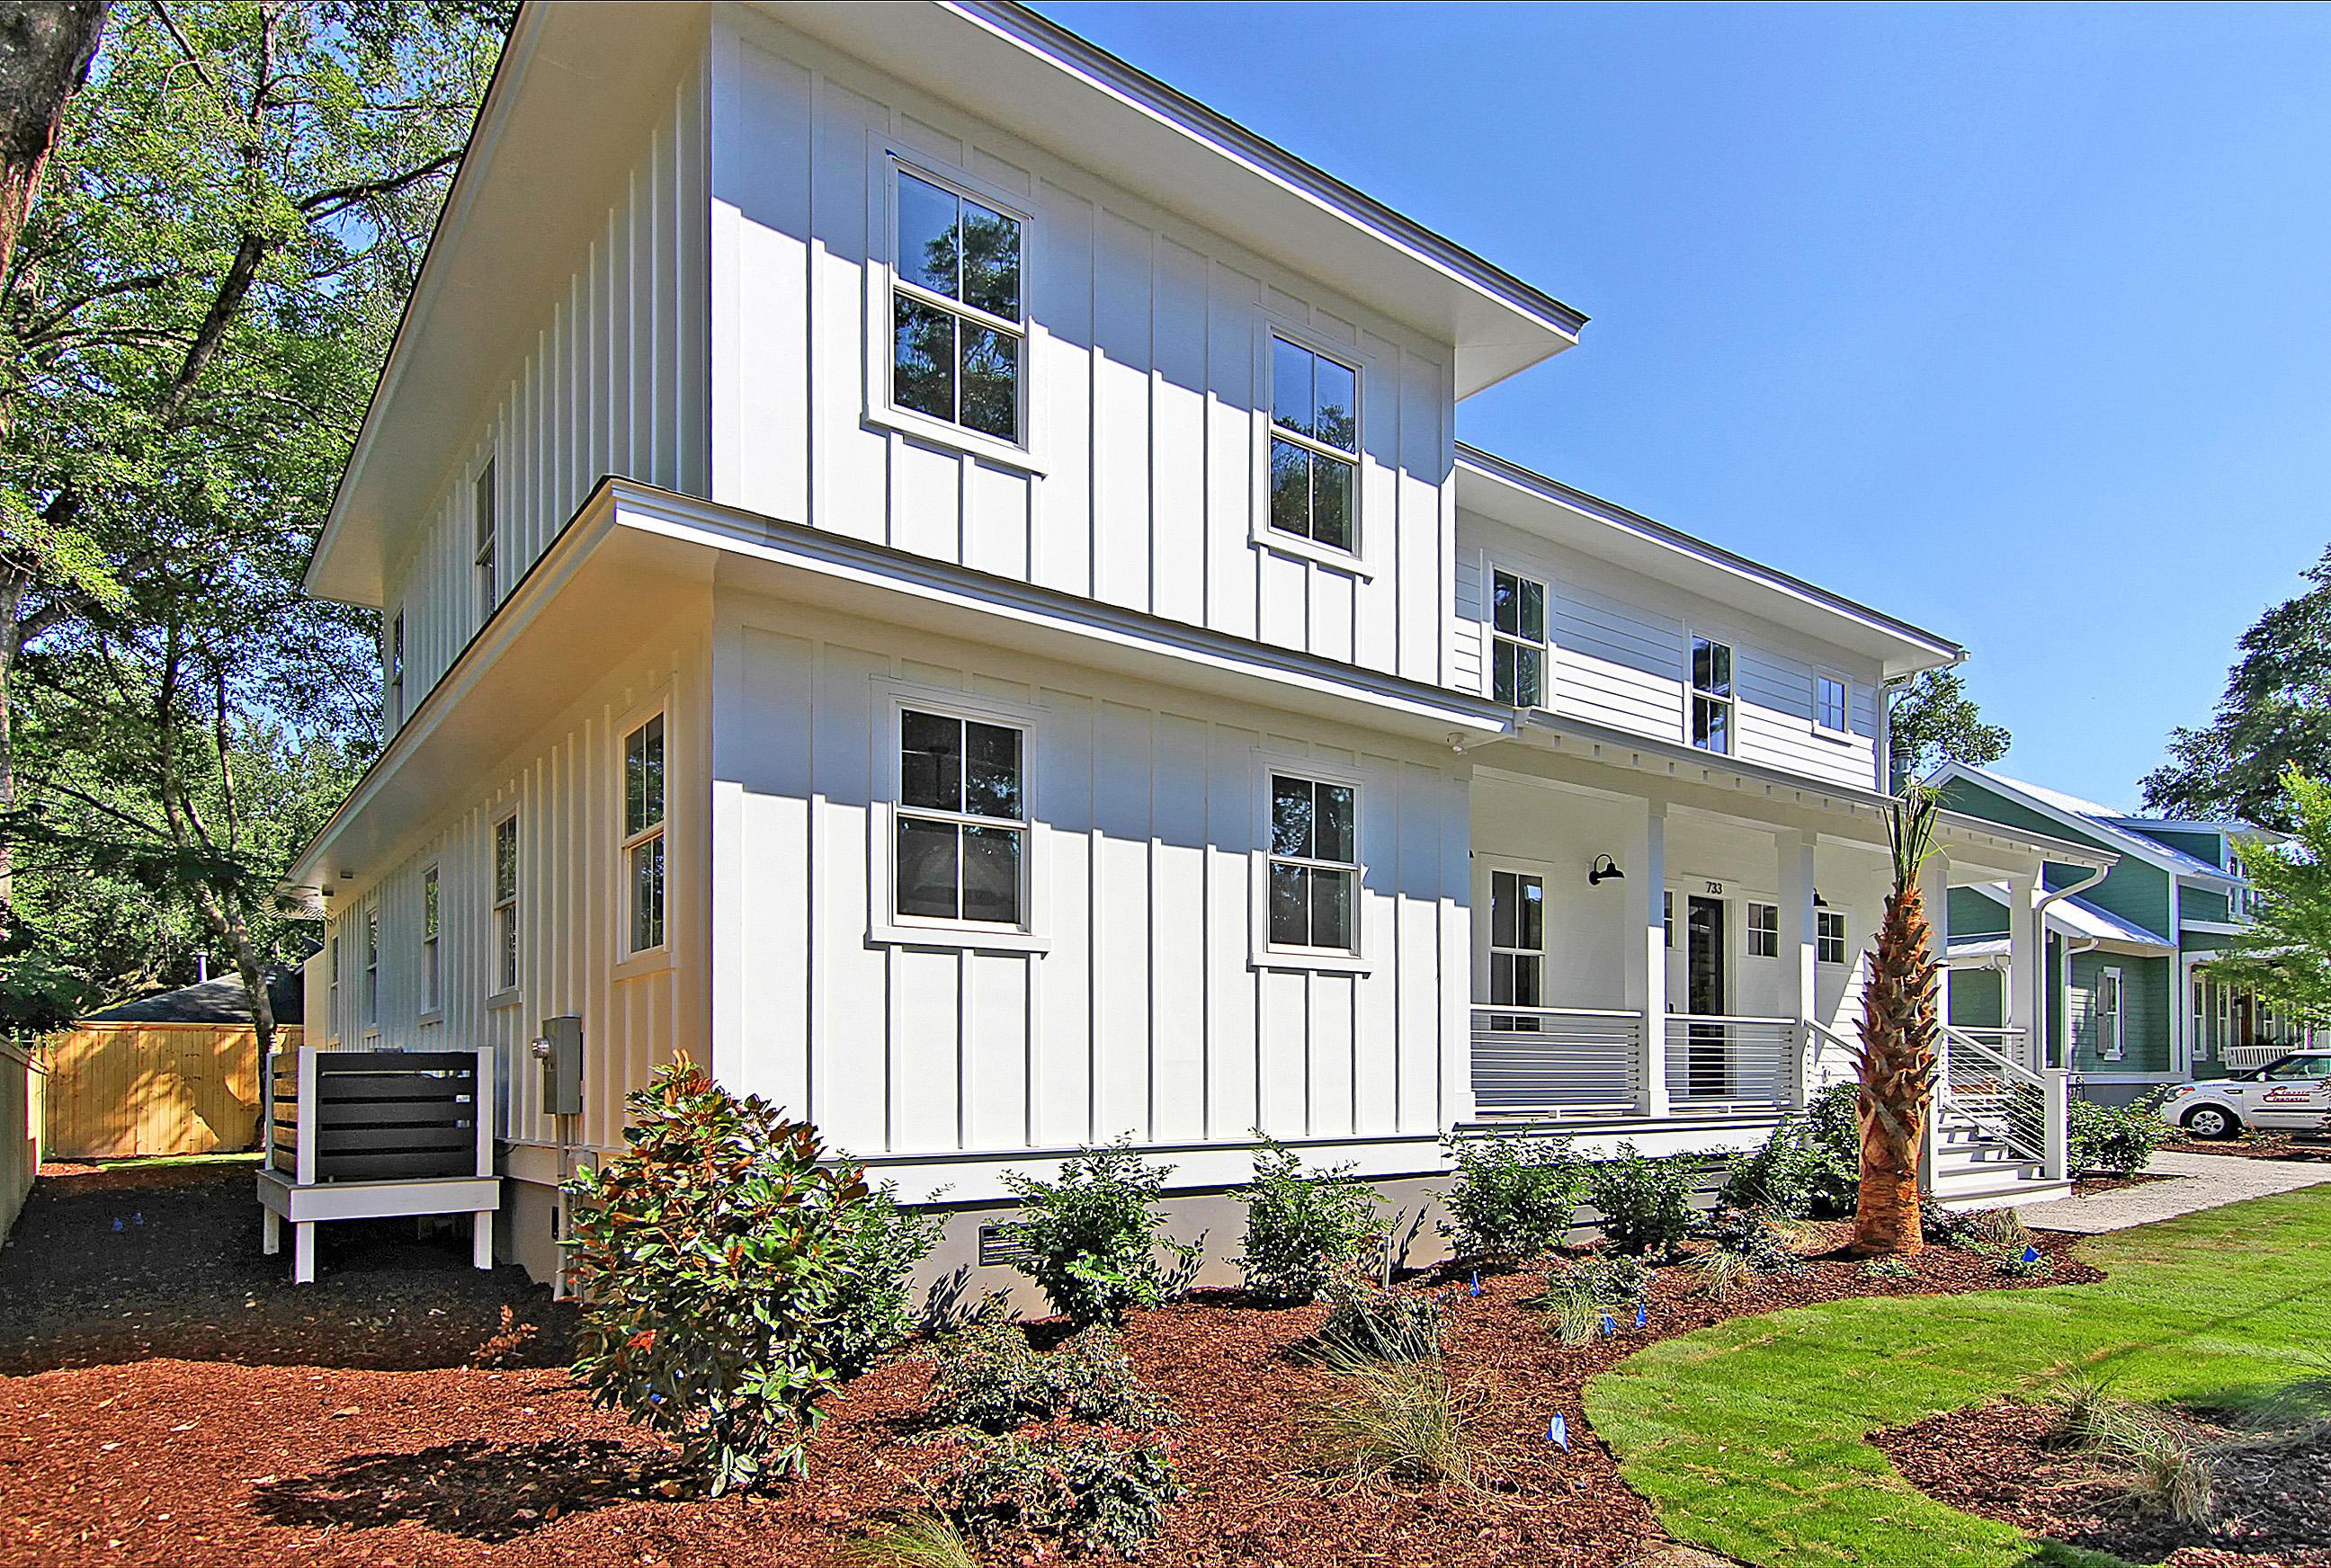 Old Mt Pleasant Homes For Sale - 733 Atlantic, Mount Pleasant, SC - 57